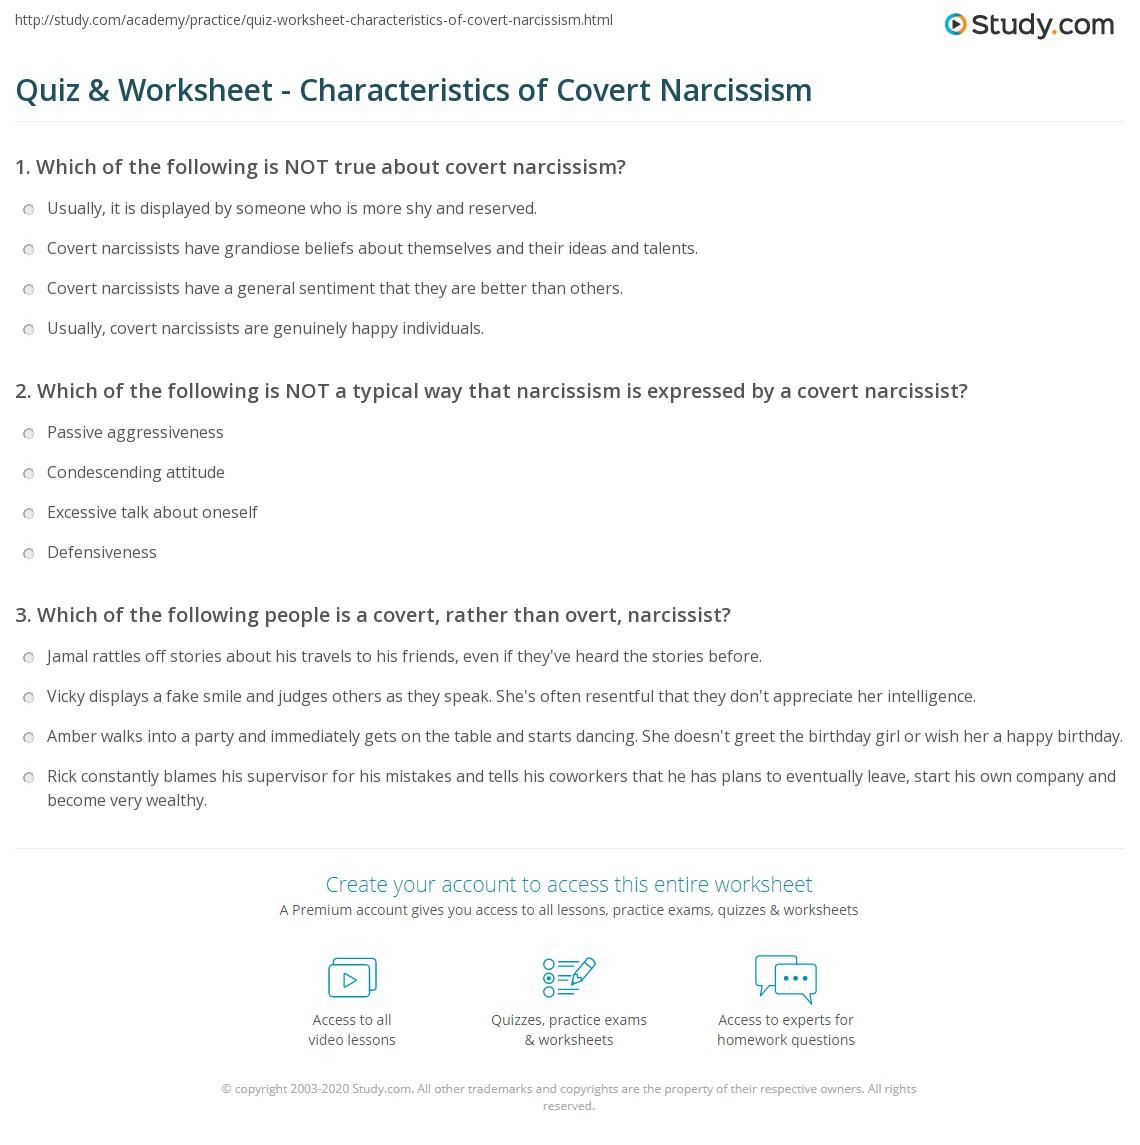 quiz worksheet characteristics of covert narcissism com print what is covert narcissism worksheet